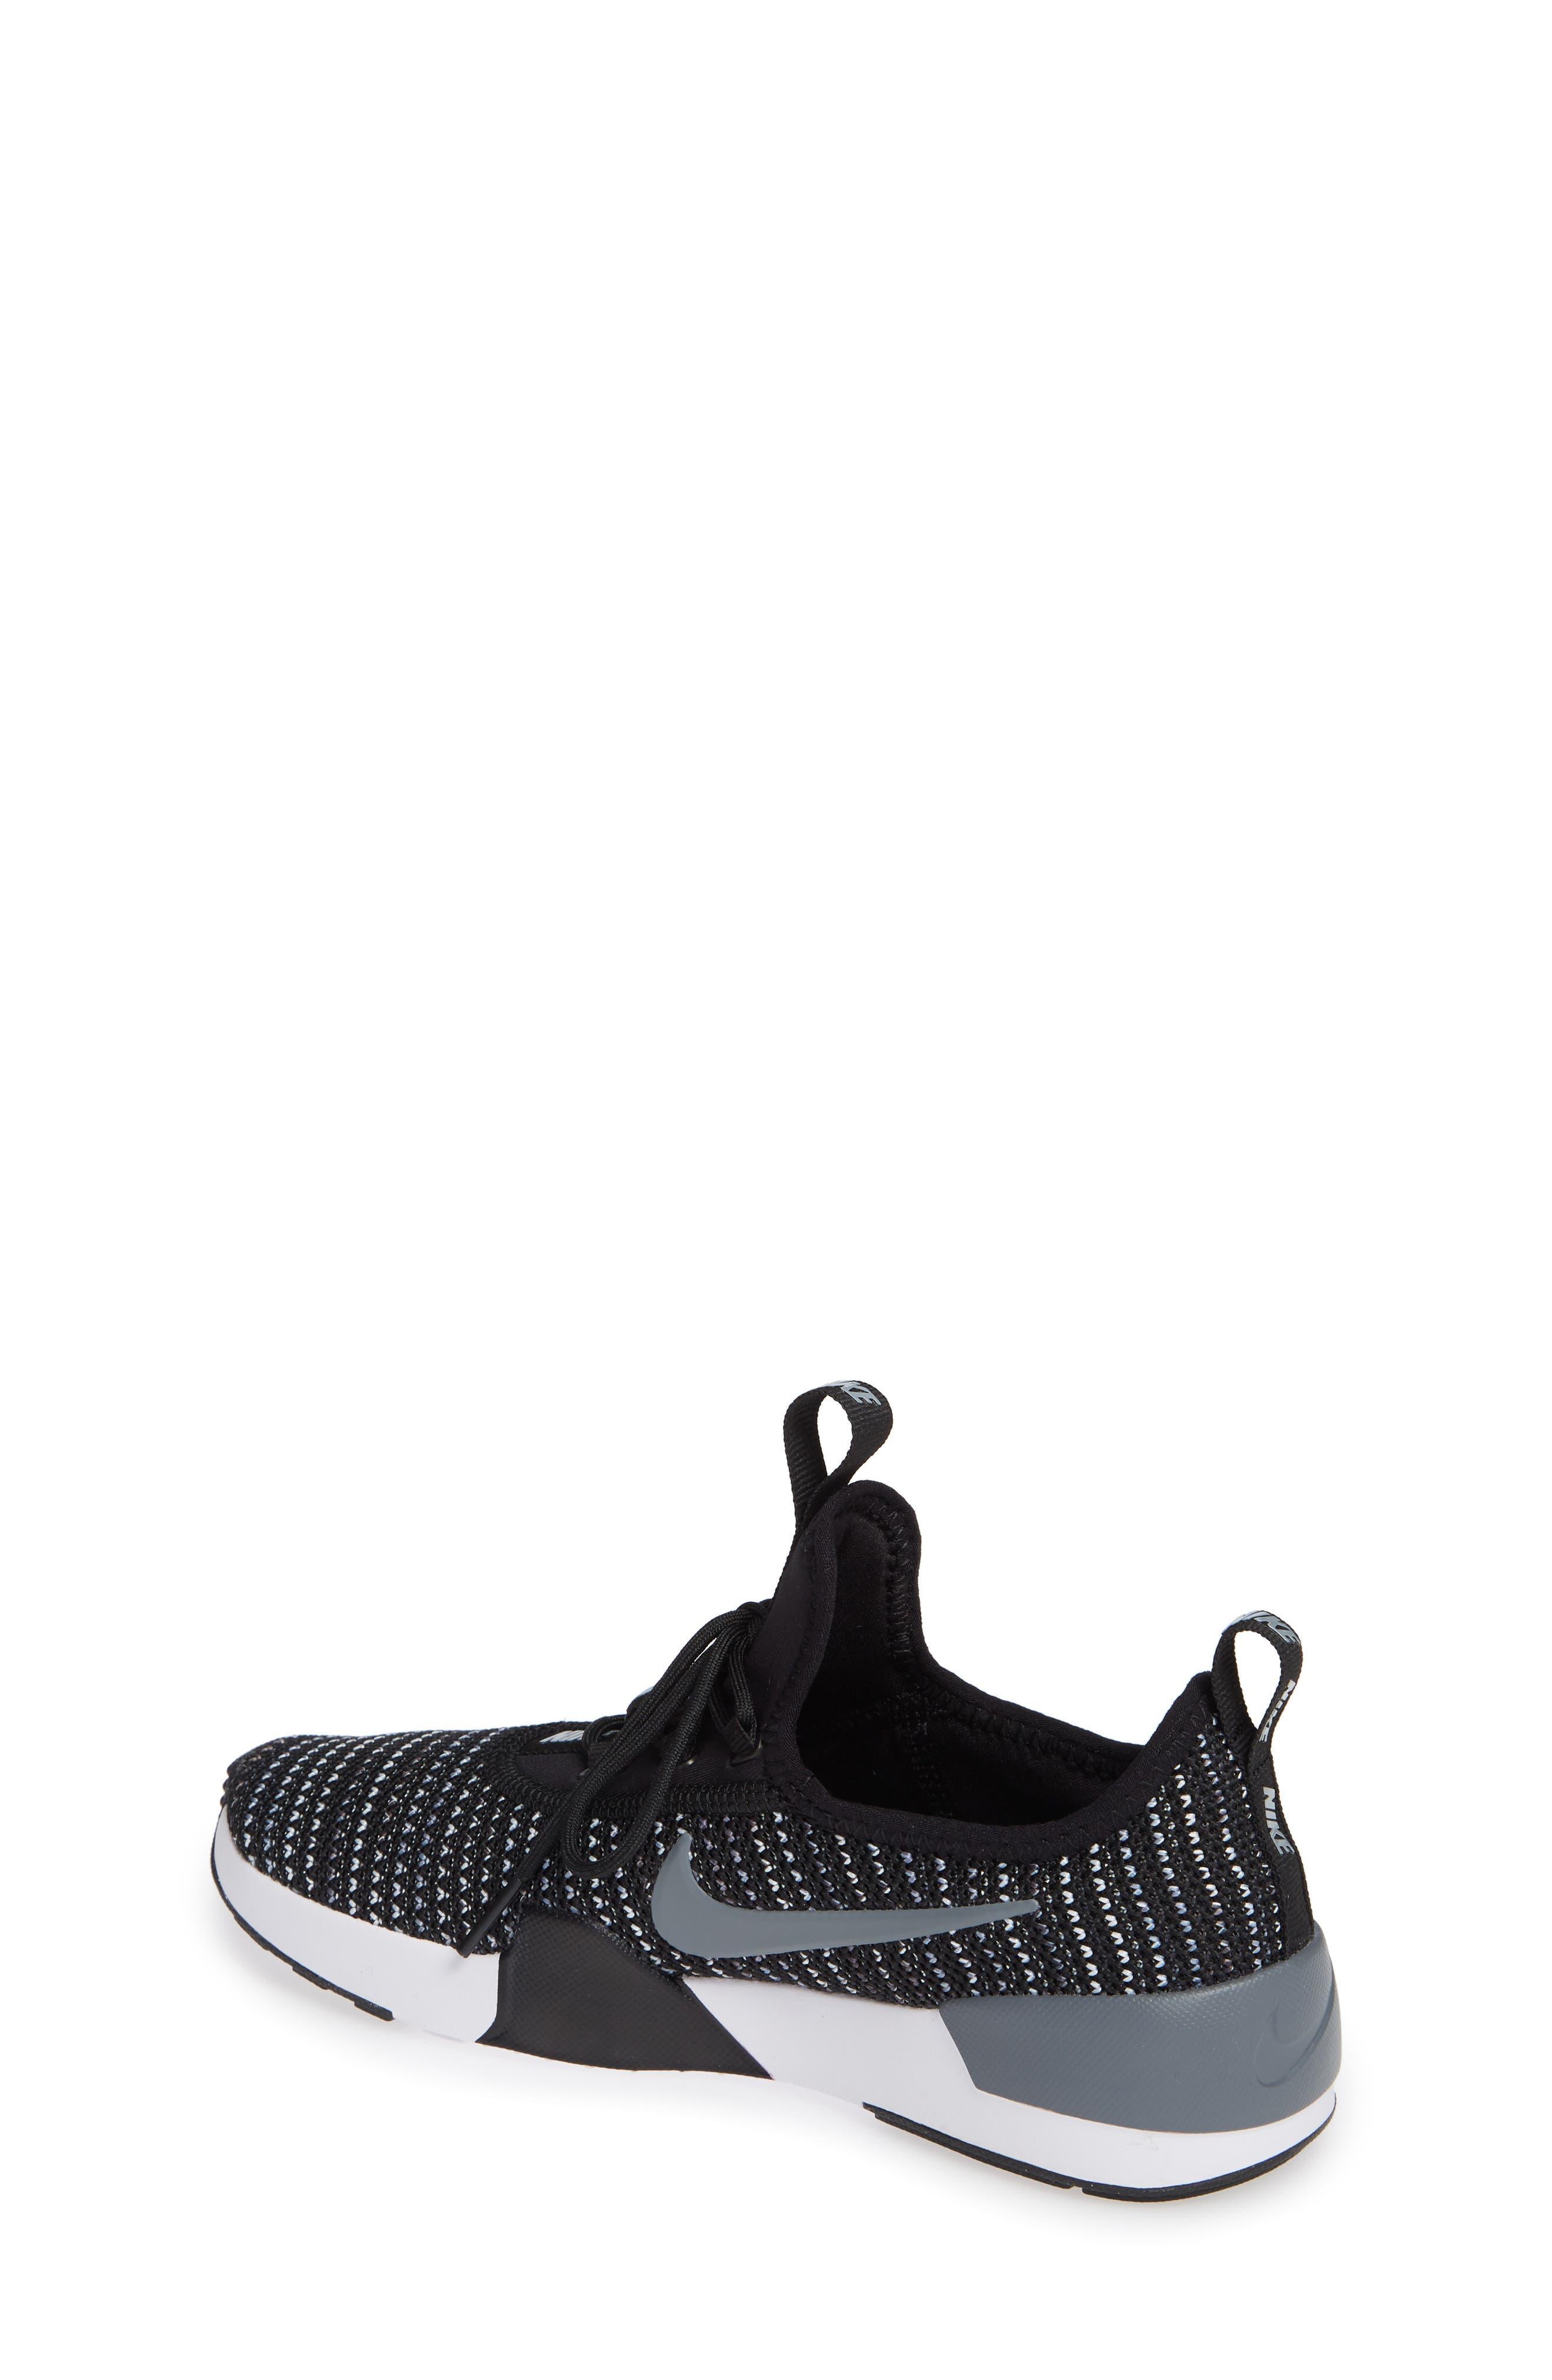 Ashin Modern Sock Knit Sneaker,                             Alternate thumbnail 2, color,                             Black/ Cool Grey/ Anthracite